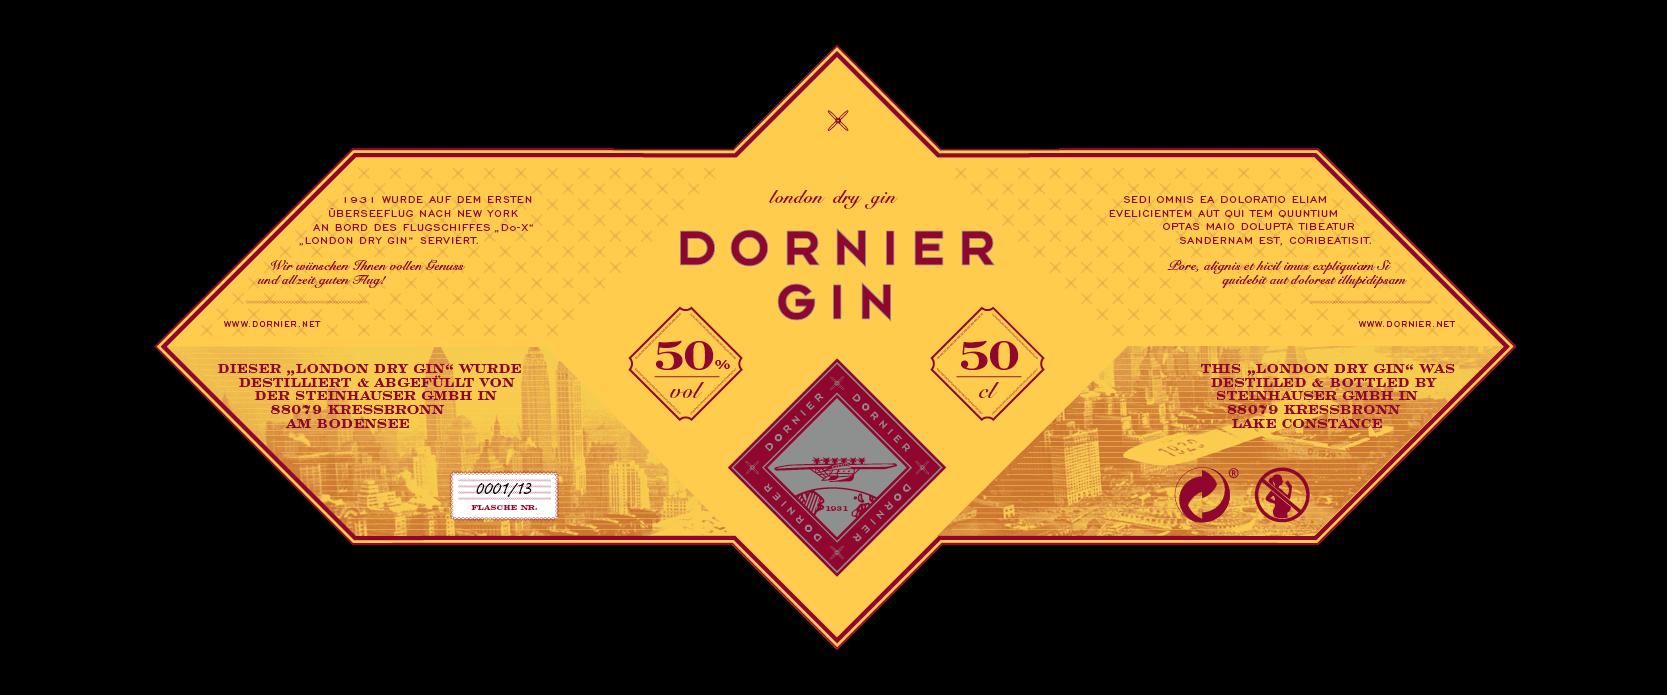 161116_dornier_gin